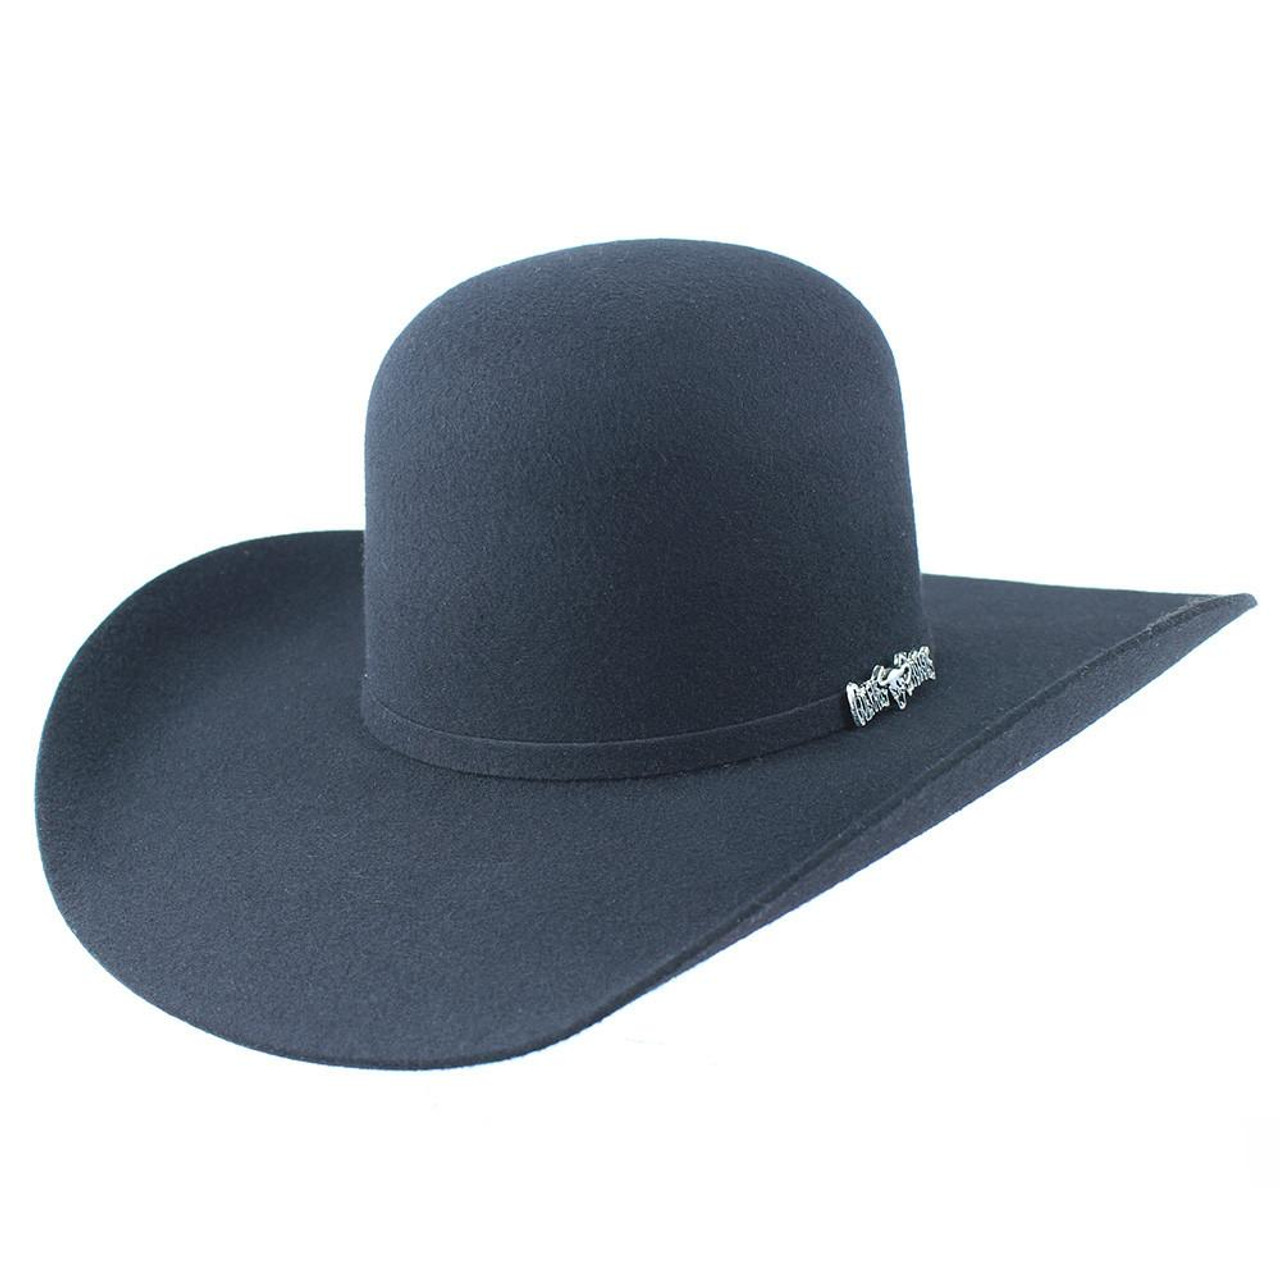 73e60b299 Cuernos Chuecos Open Crown Cowboy Felt Hat